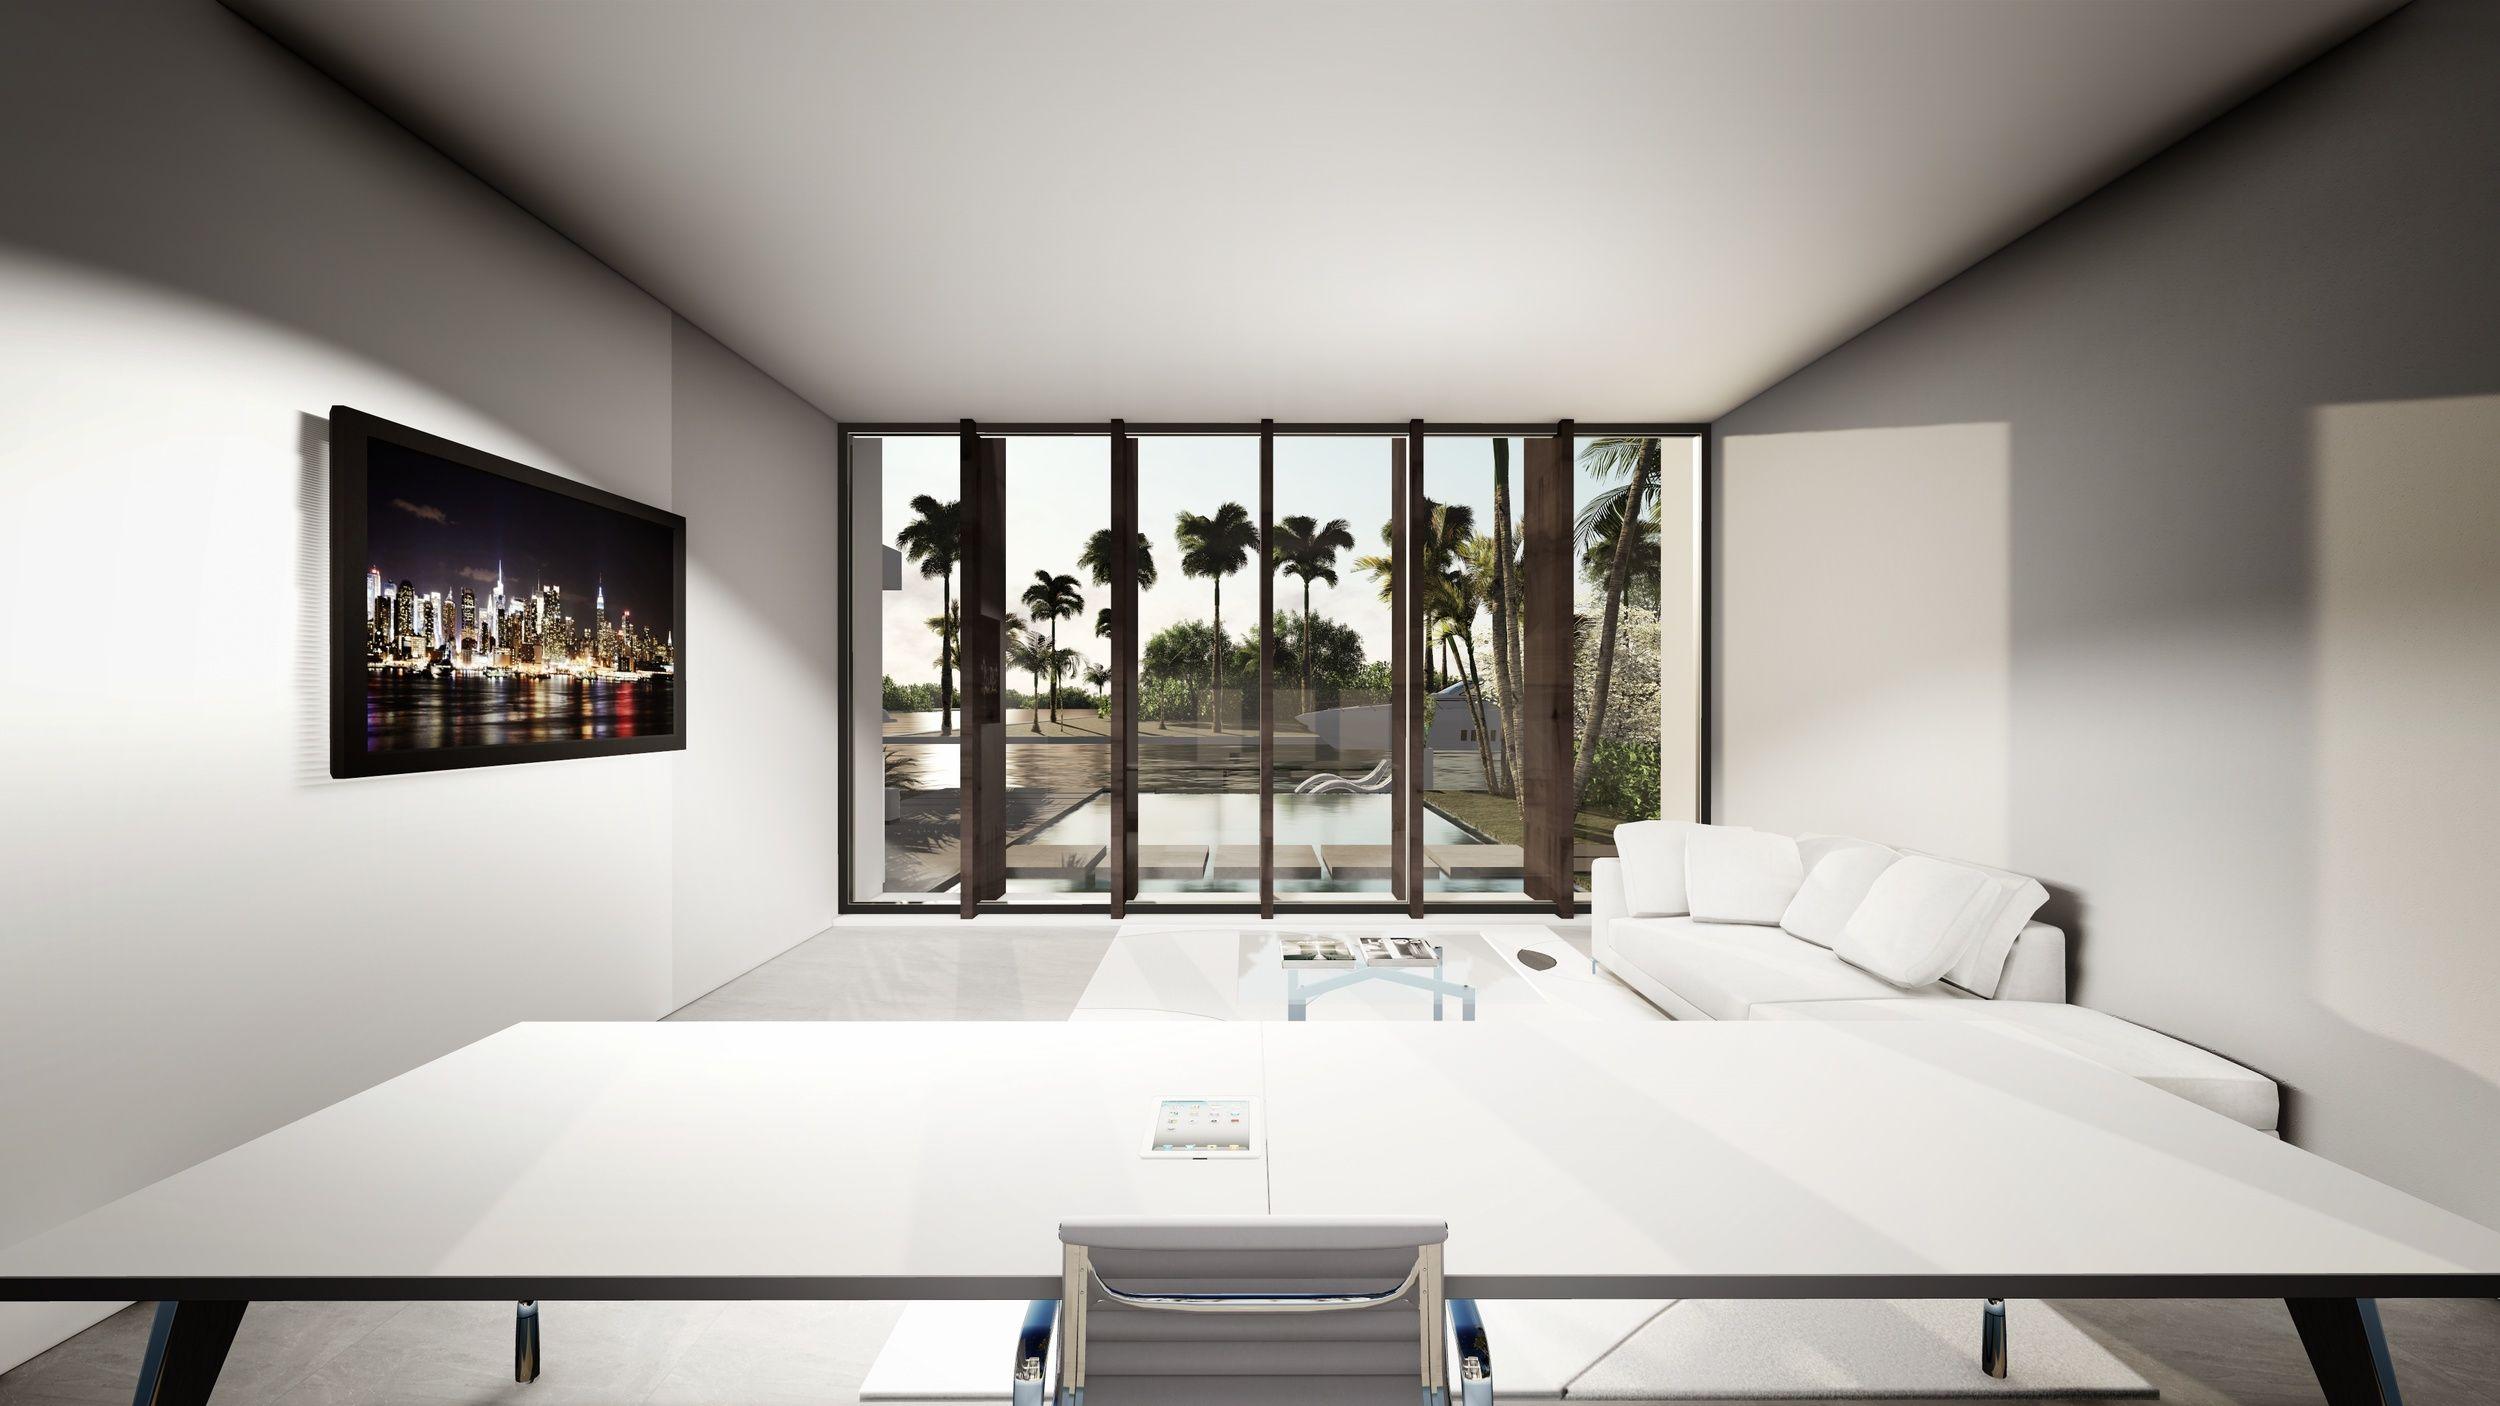 Tradewinds Interior Home Office Modern Design By KoDA Miami Tradewinds  Sunlight Projection Modern Design By KoDA Miami #officeinspiration #miami #  ...